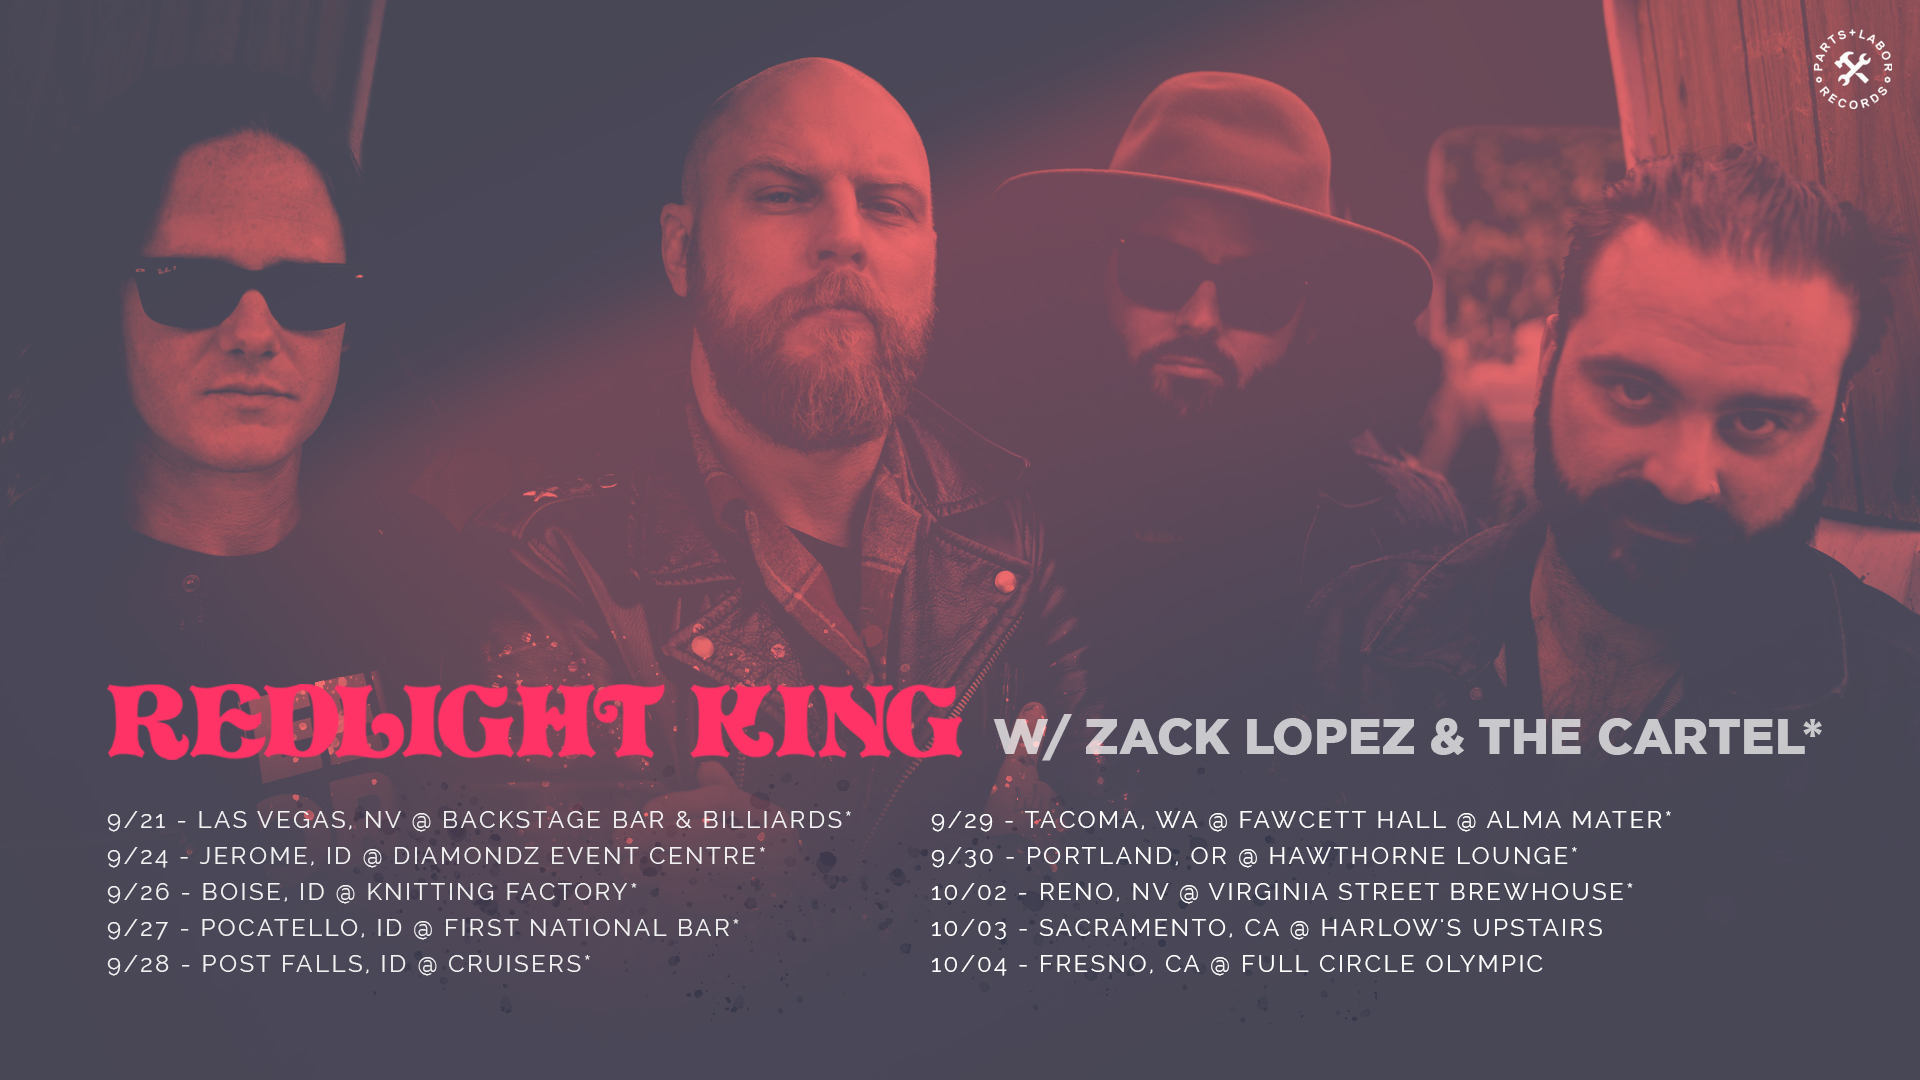 Redlight King - Tour Announcement - Fall2019 - 1920x1080 FINAL ANNC.jpg